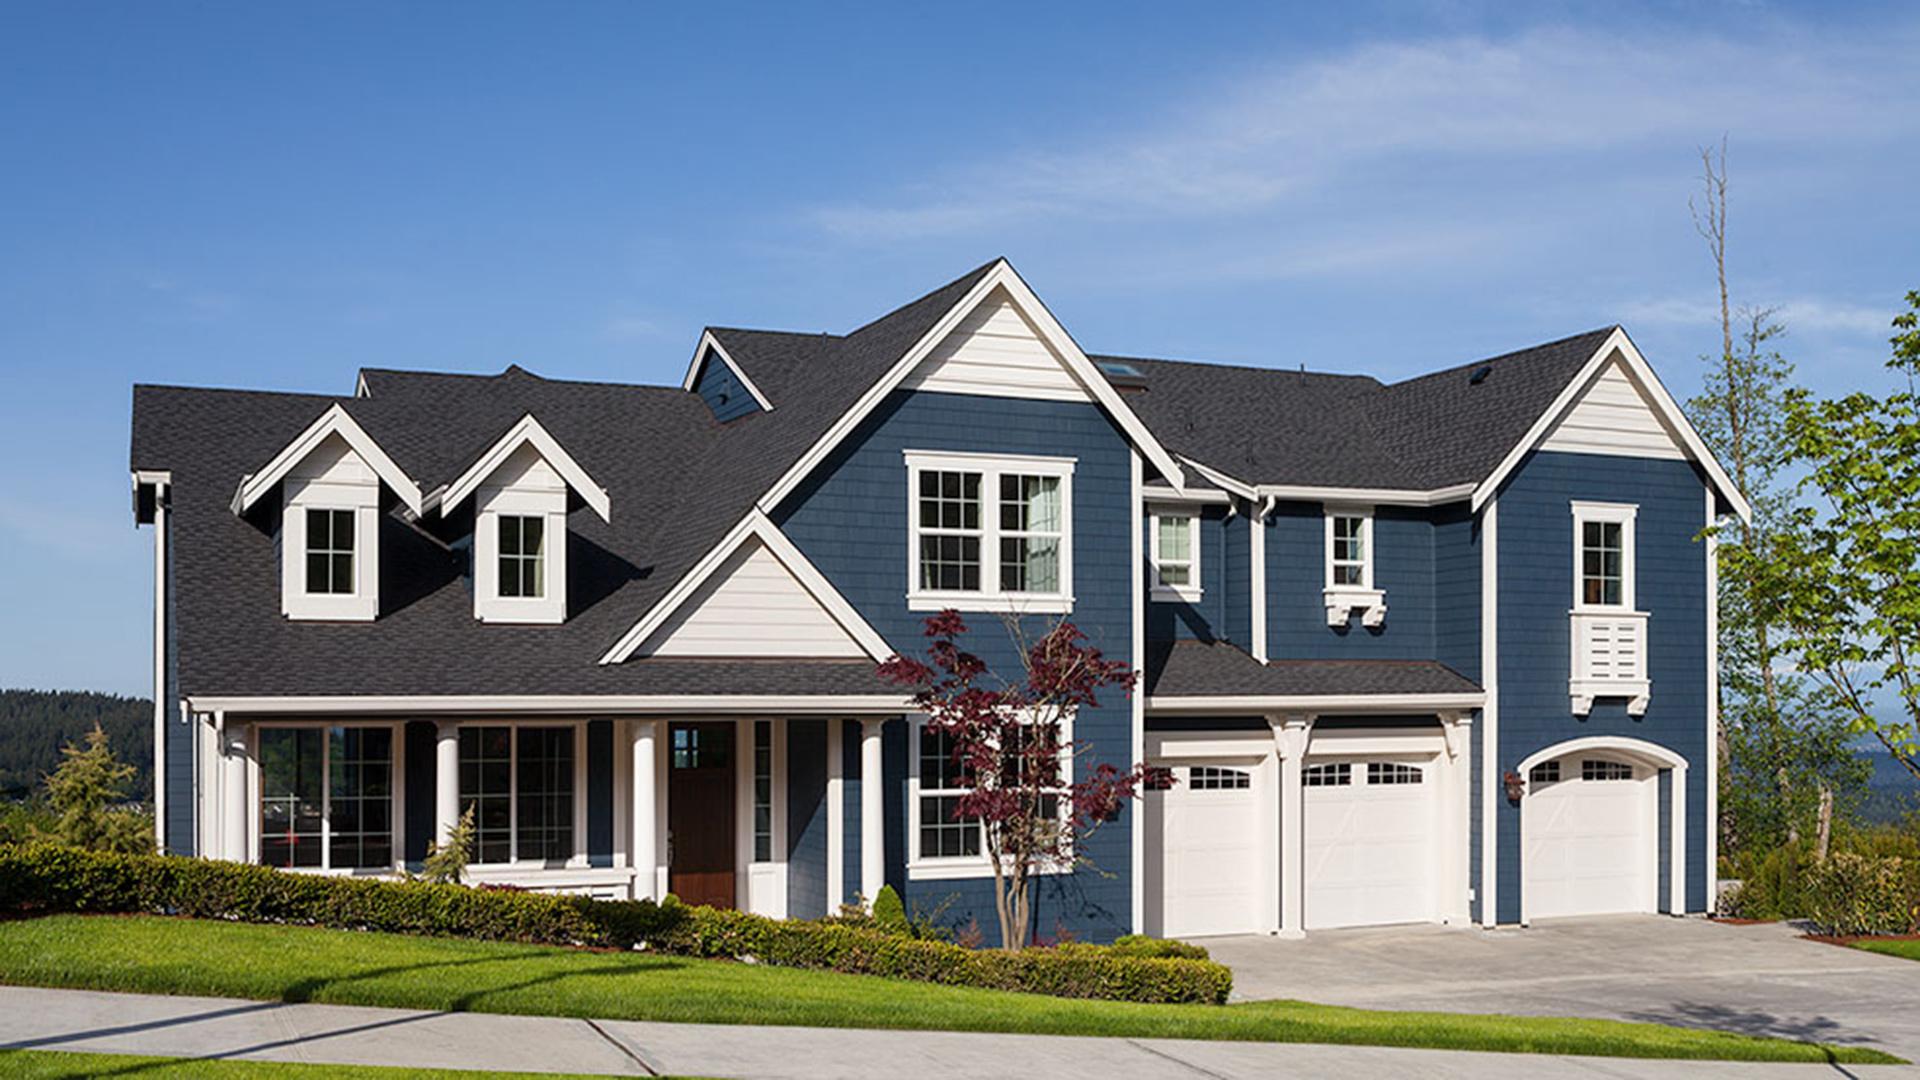 The Putvin home design has a charming